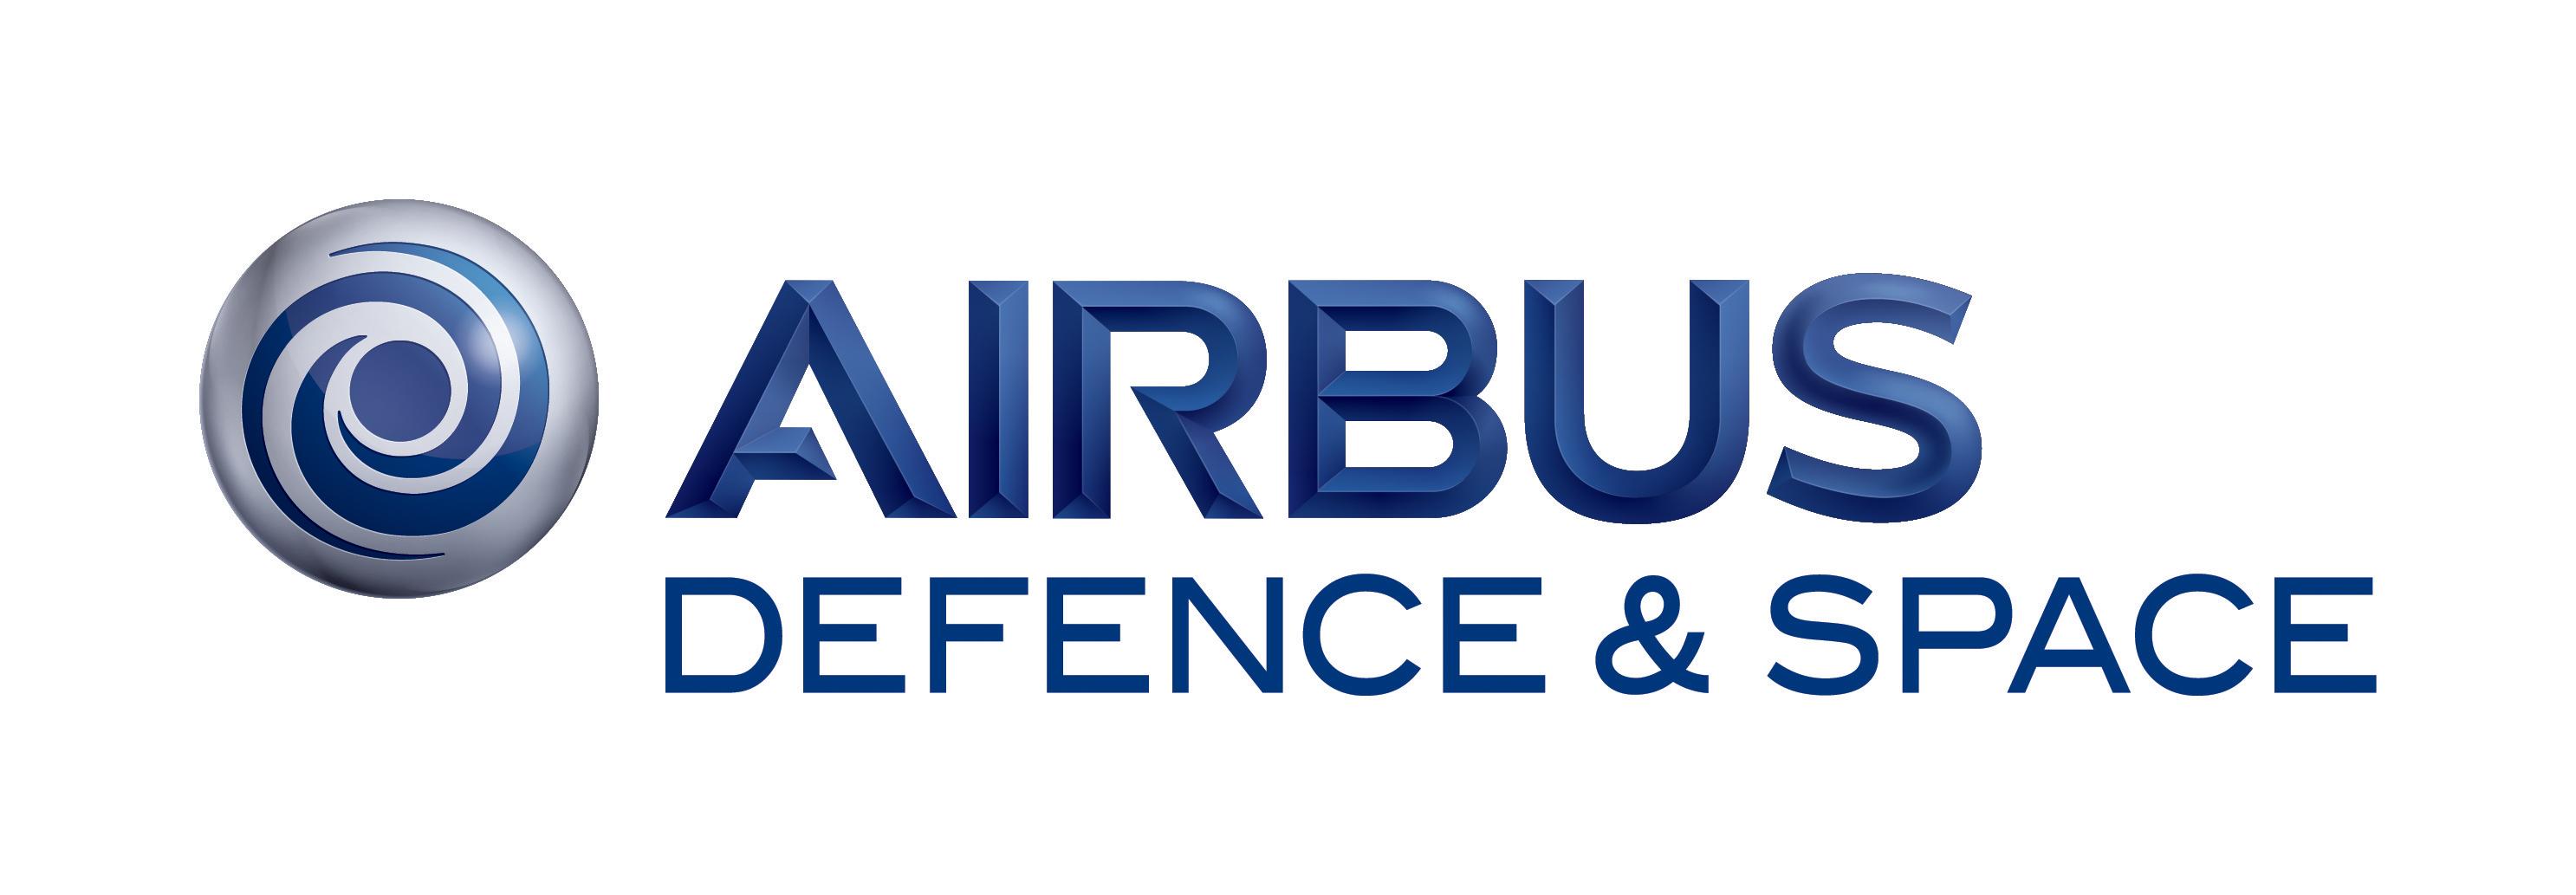 Airbus Defence and Space AS valgte Avsperringer.no for sine avsperringsbehov.